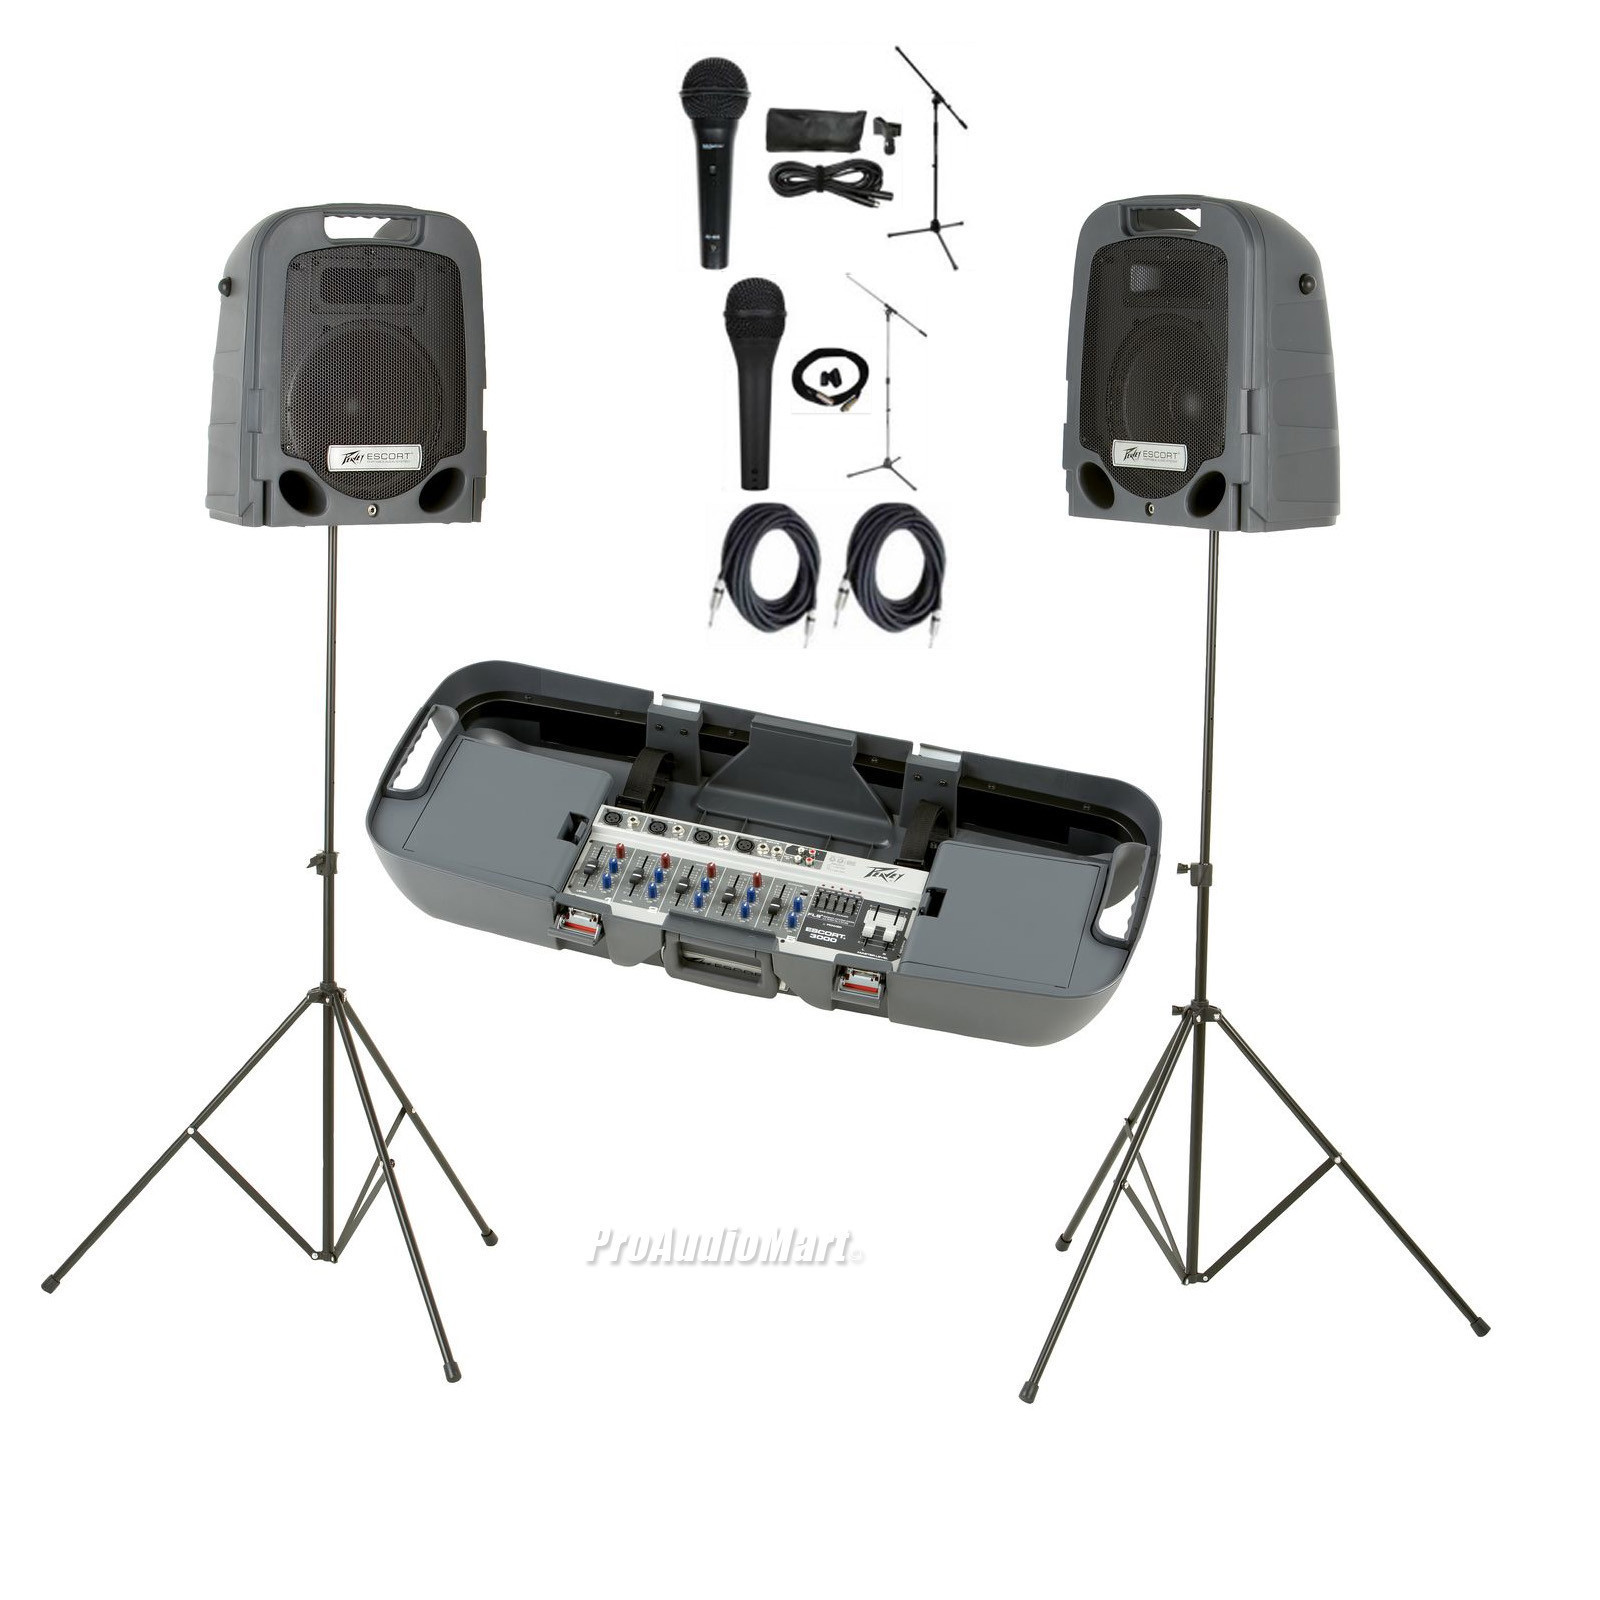 portable pa system hire speakers microphone graphic equaliser easy setup projectorhire rental. Black Bedroom Furniture Sets. Home Design Ideas